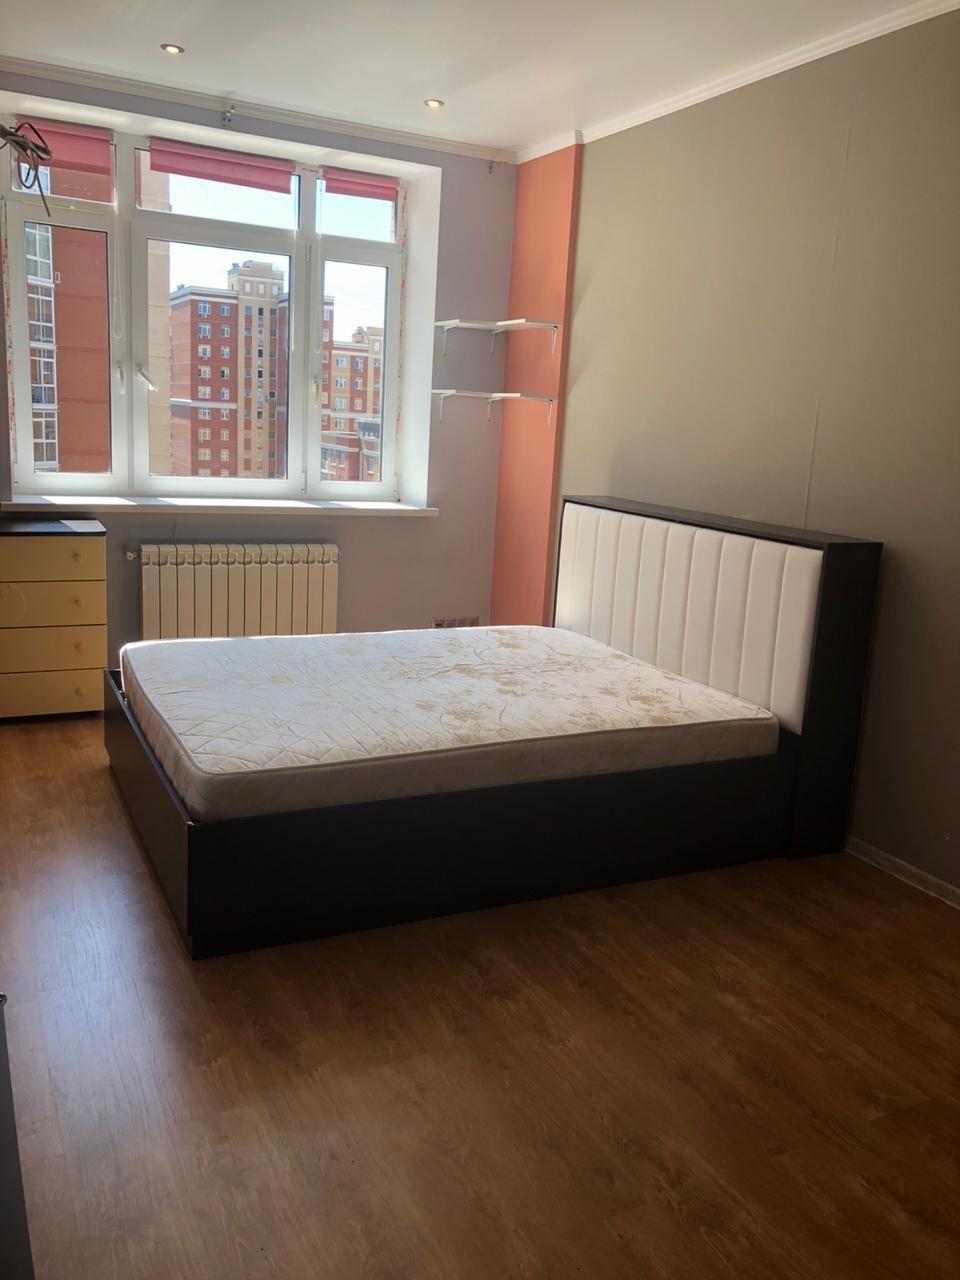 Квартира, 1 комната, 47 м² в Коммунарке 89055769697 купить 1